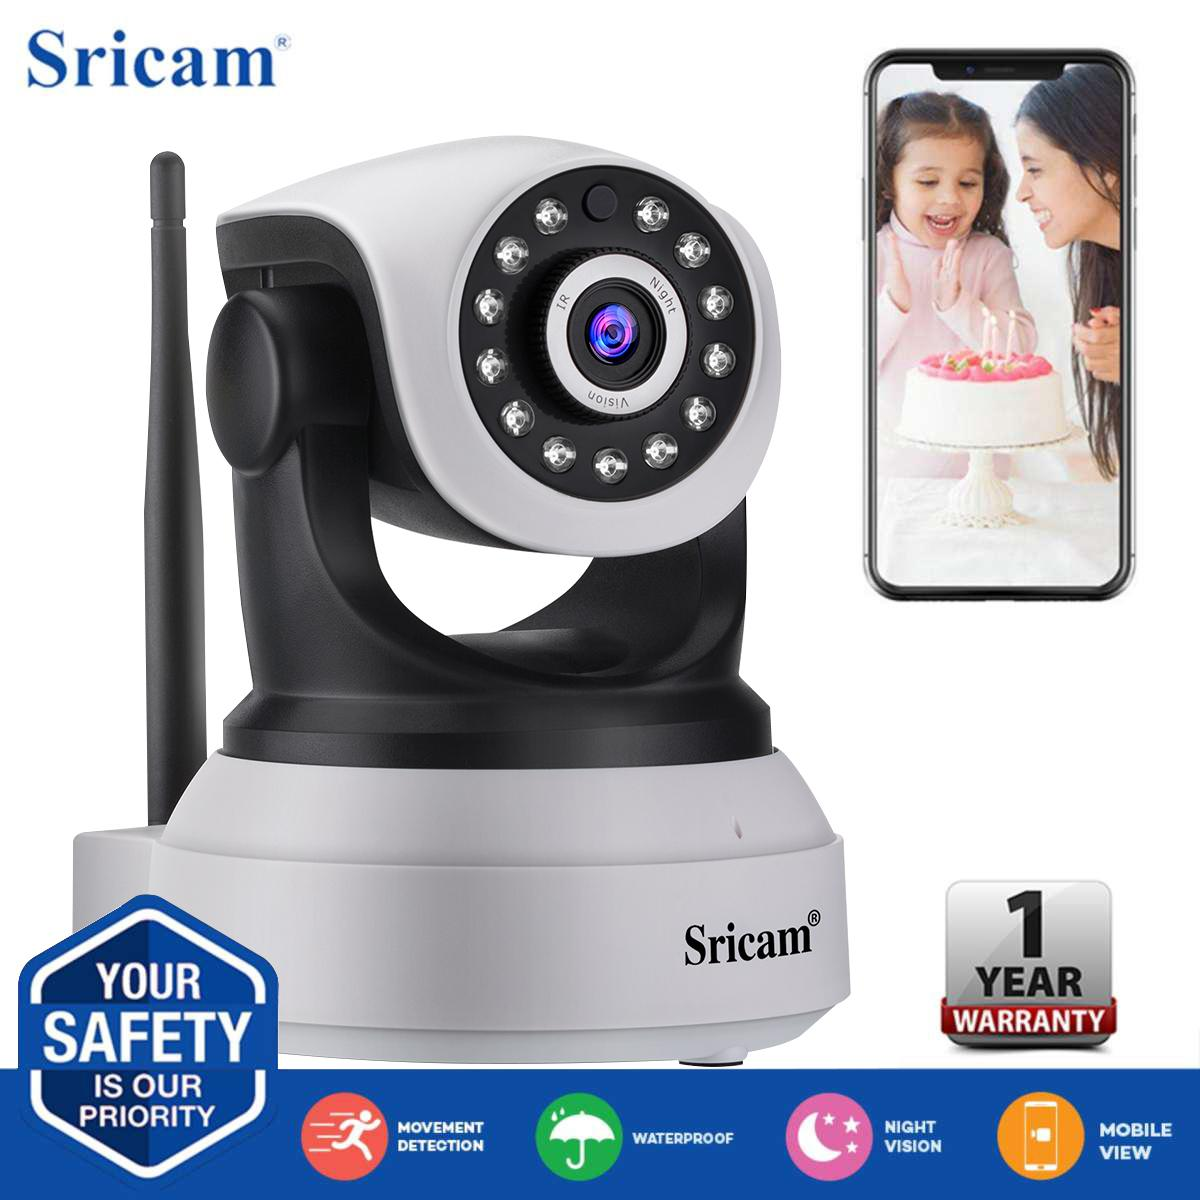 Sricam SP017 1080P HD IP Camera Wireless IR Night Vision Camera NVR P2P  Motion Detection 355 bca10c2619